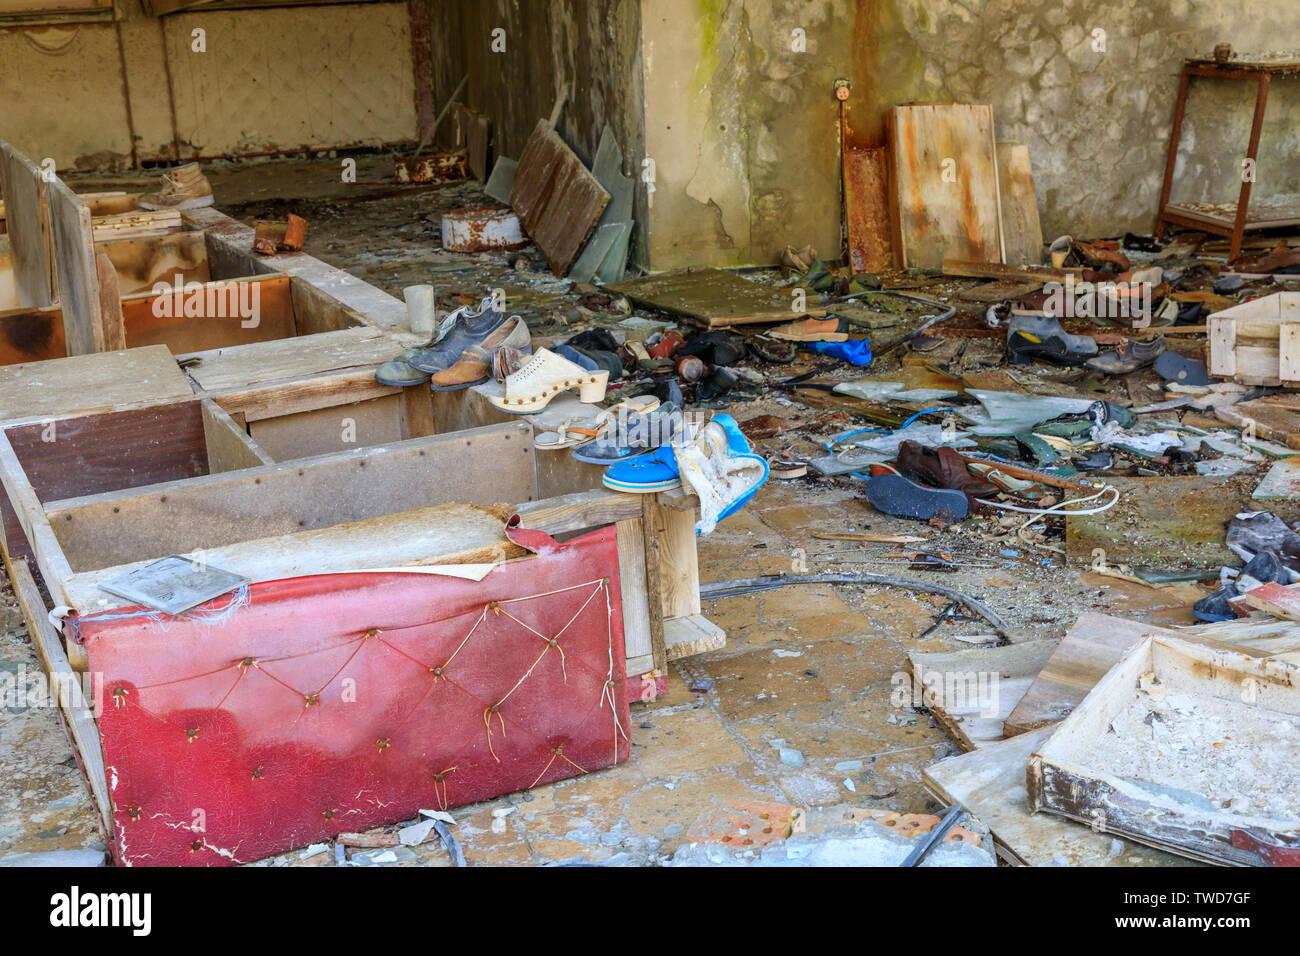 Eastern Europe, Ukraine, Pripyat, Chernobyl. Shoe store. - Stock Image